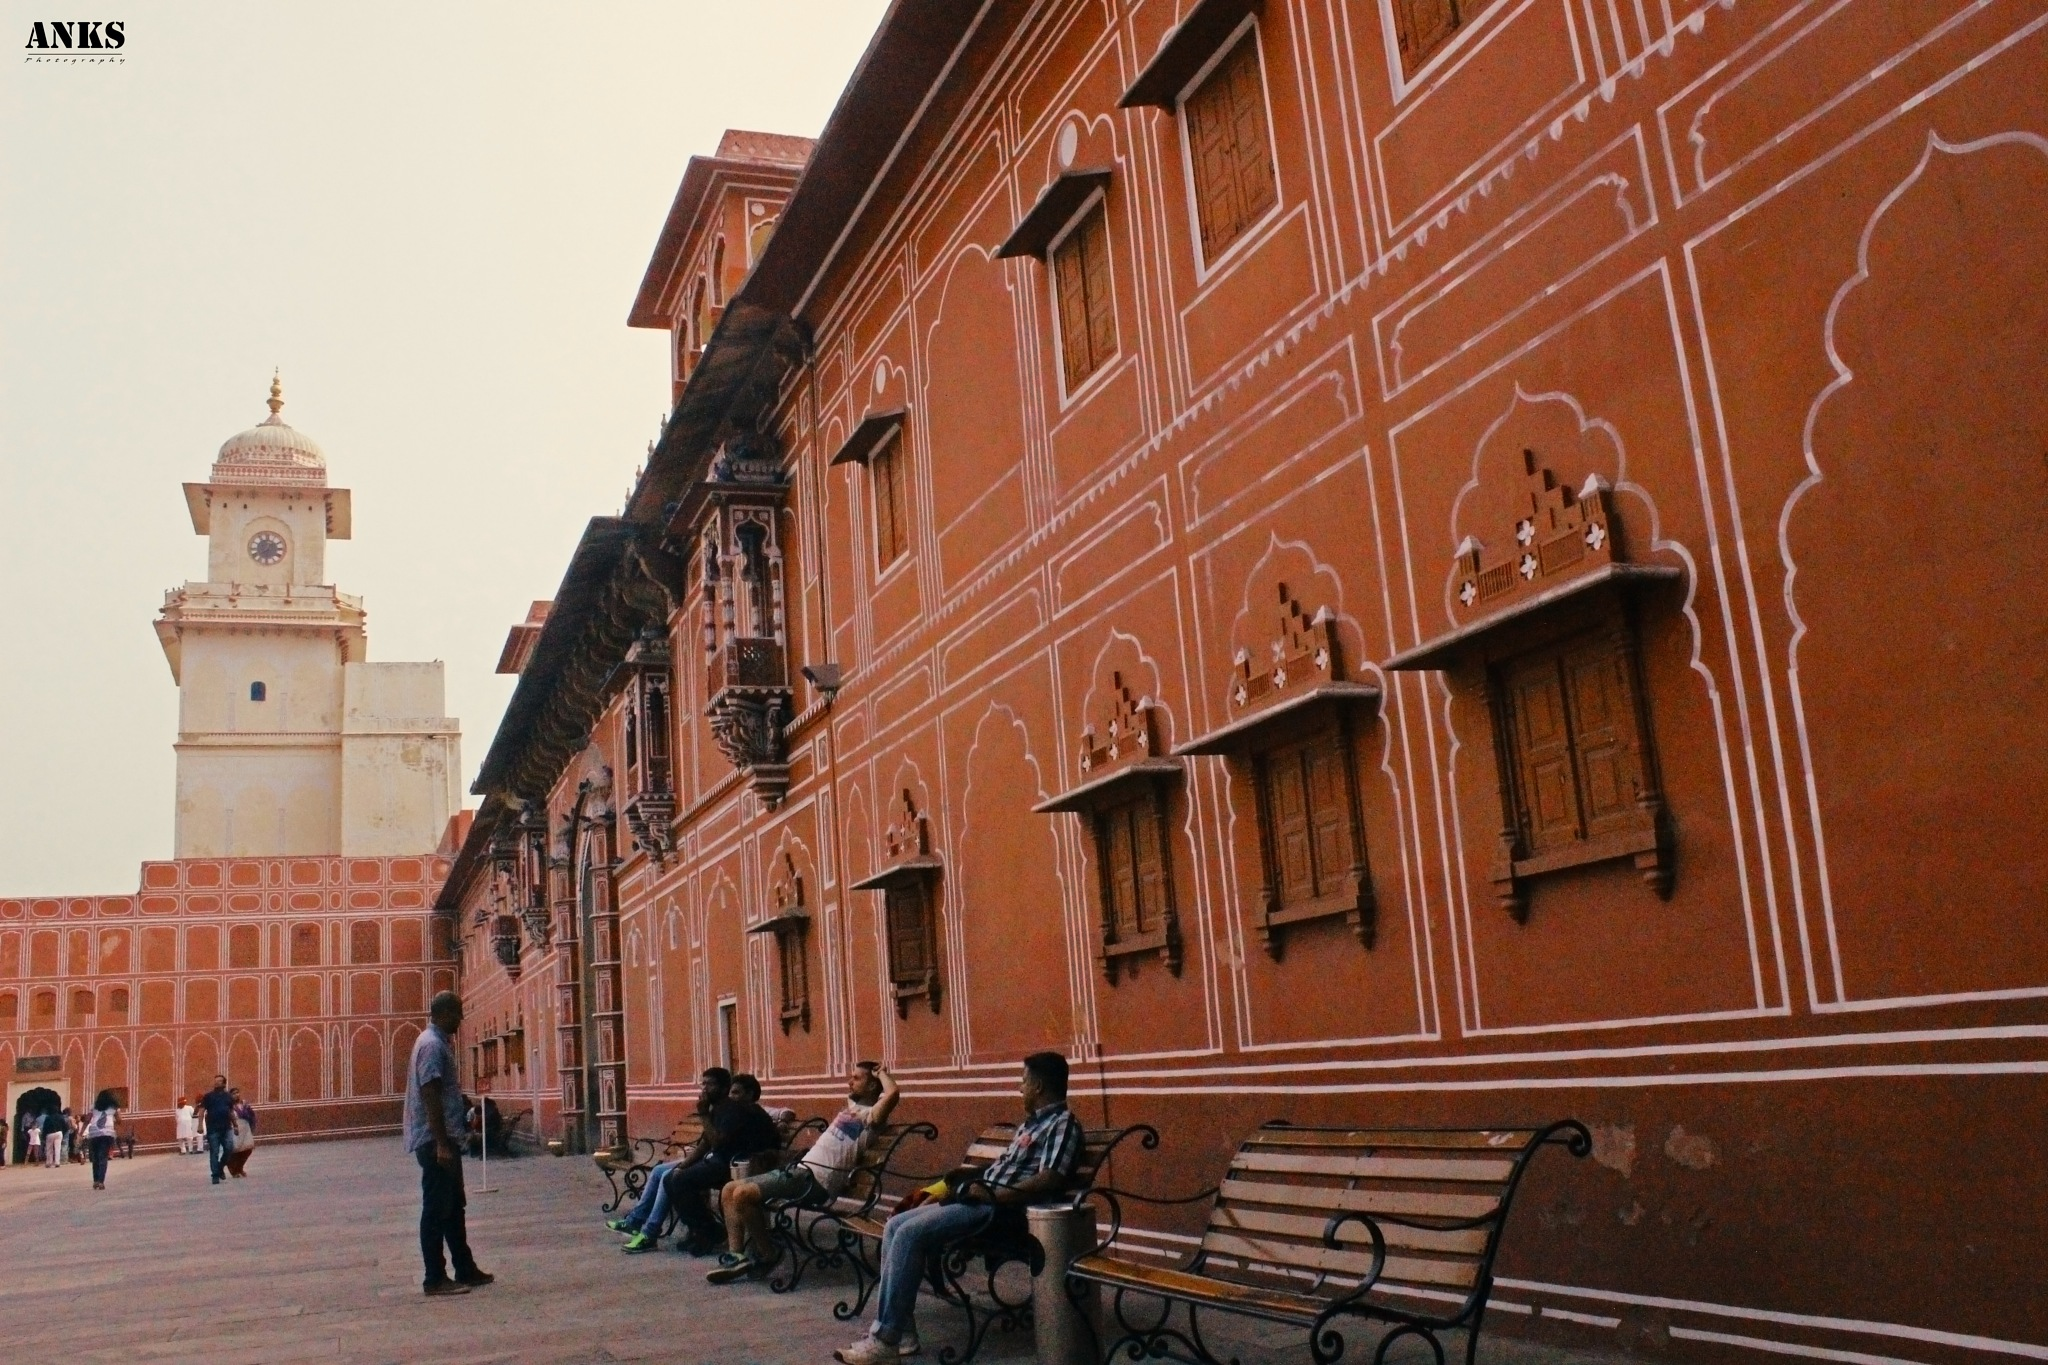 jaipur_pinkcity by Anks Photography